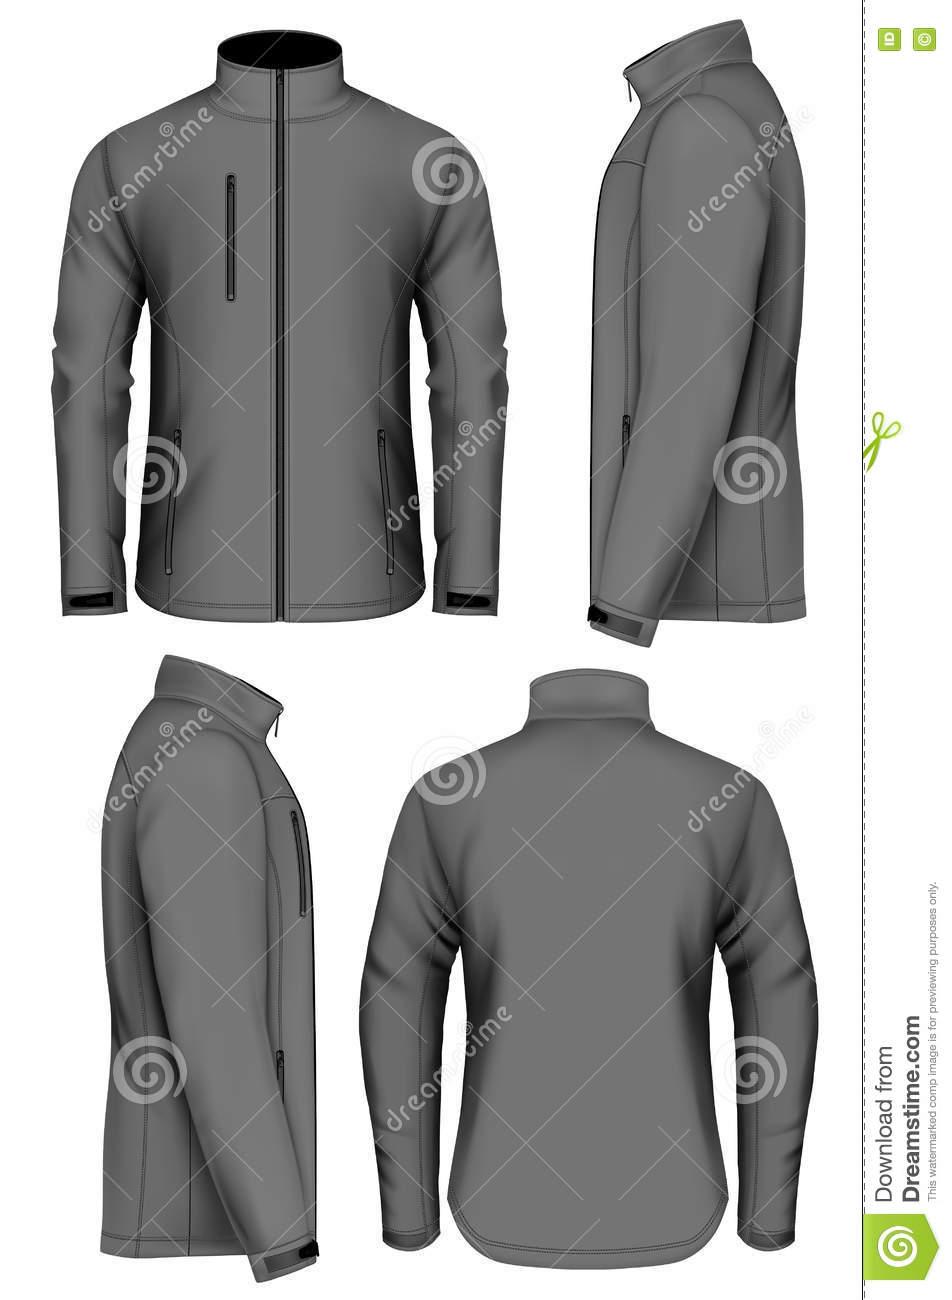 Men Softshell Jacket Design Template Stock Vector.